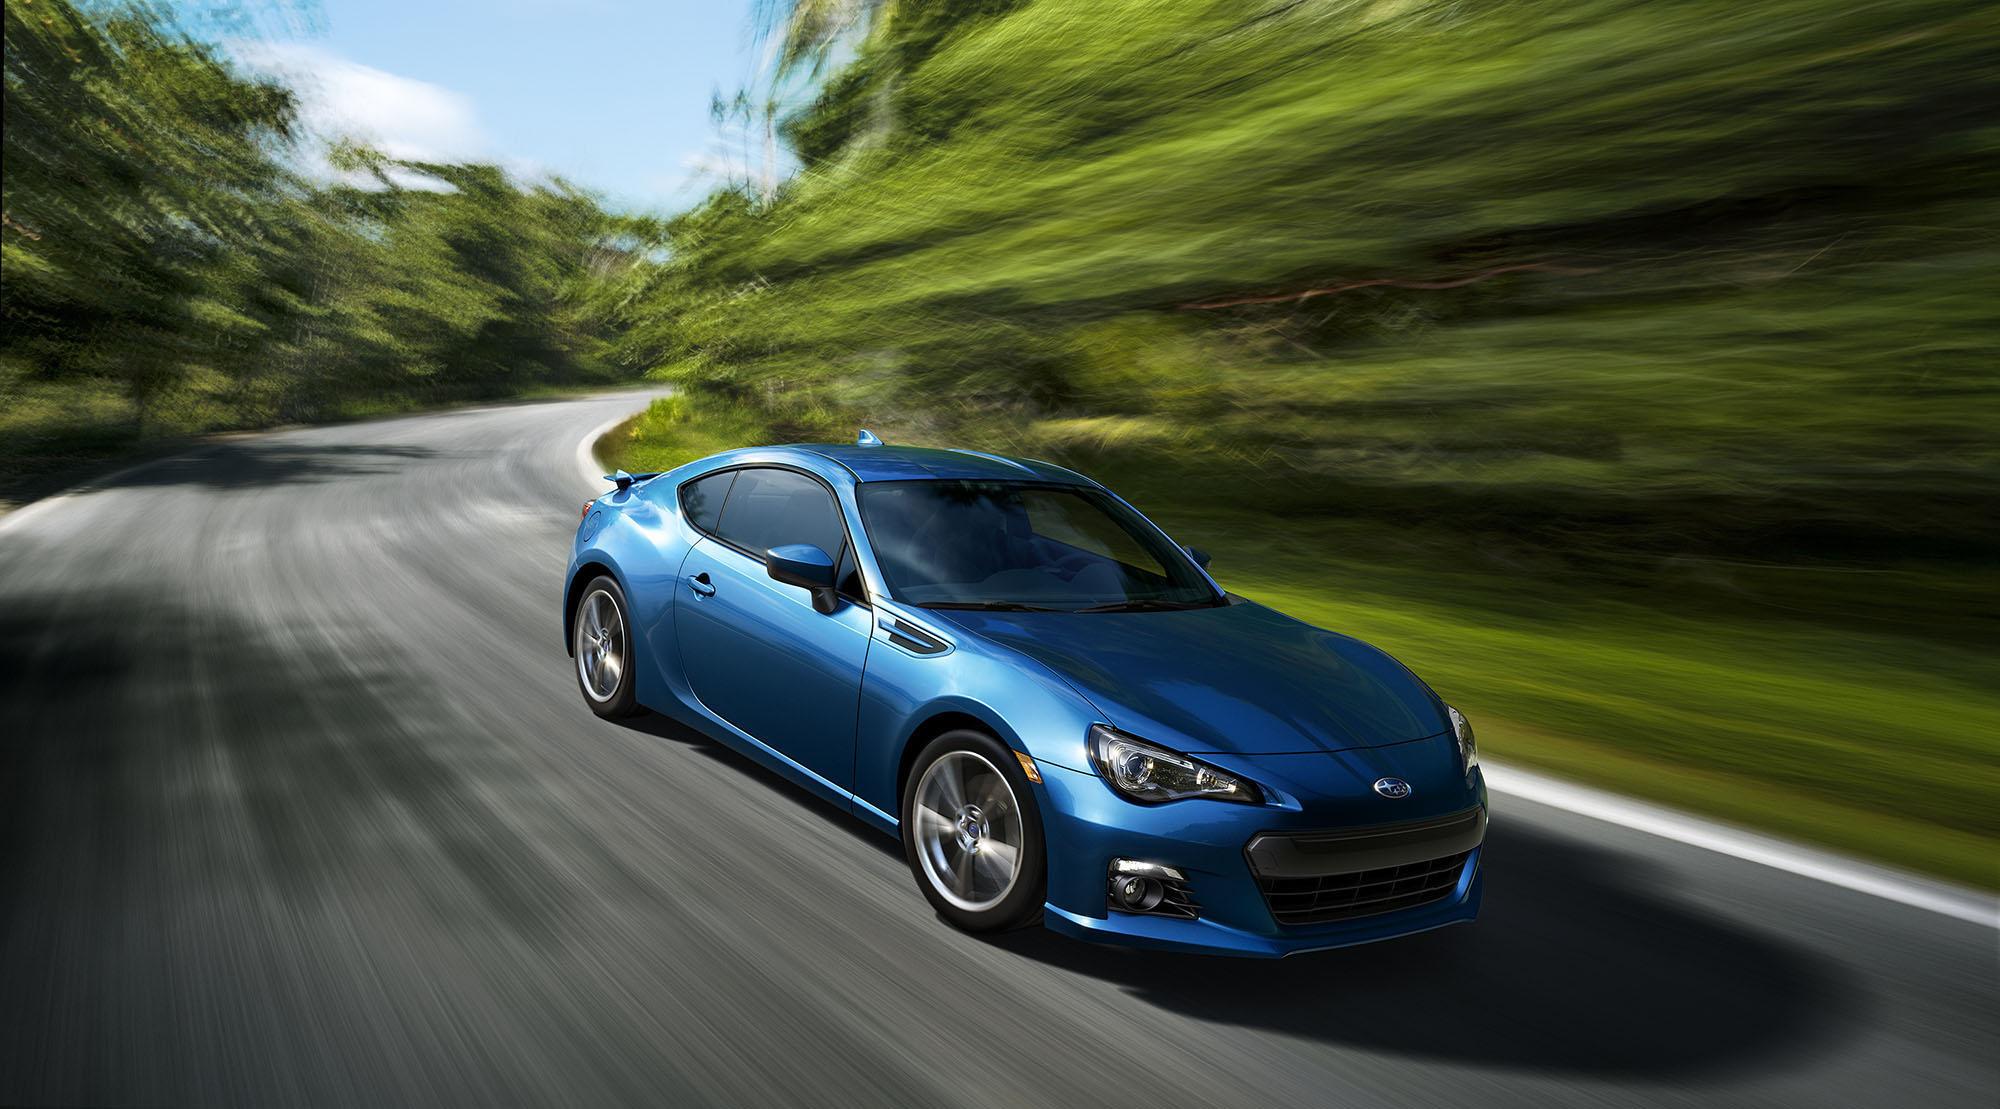 Subaru Announces Pricing For 2016 Brz Sports Car